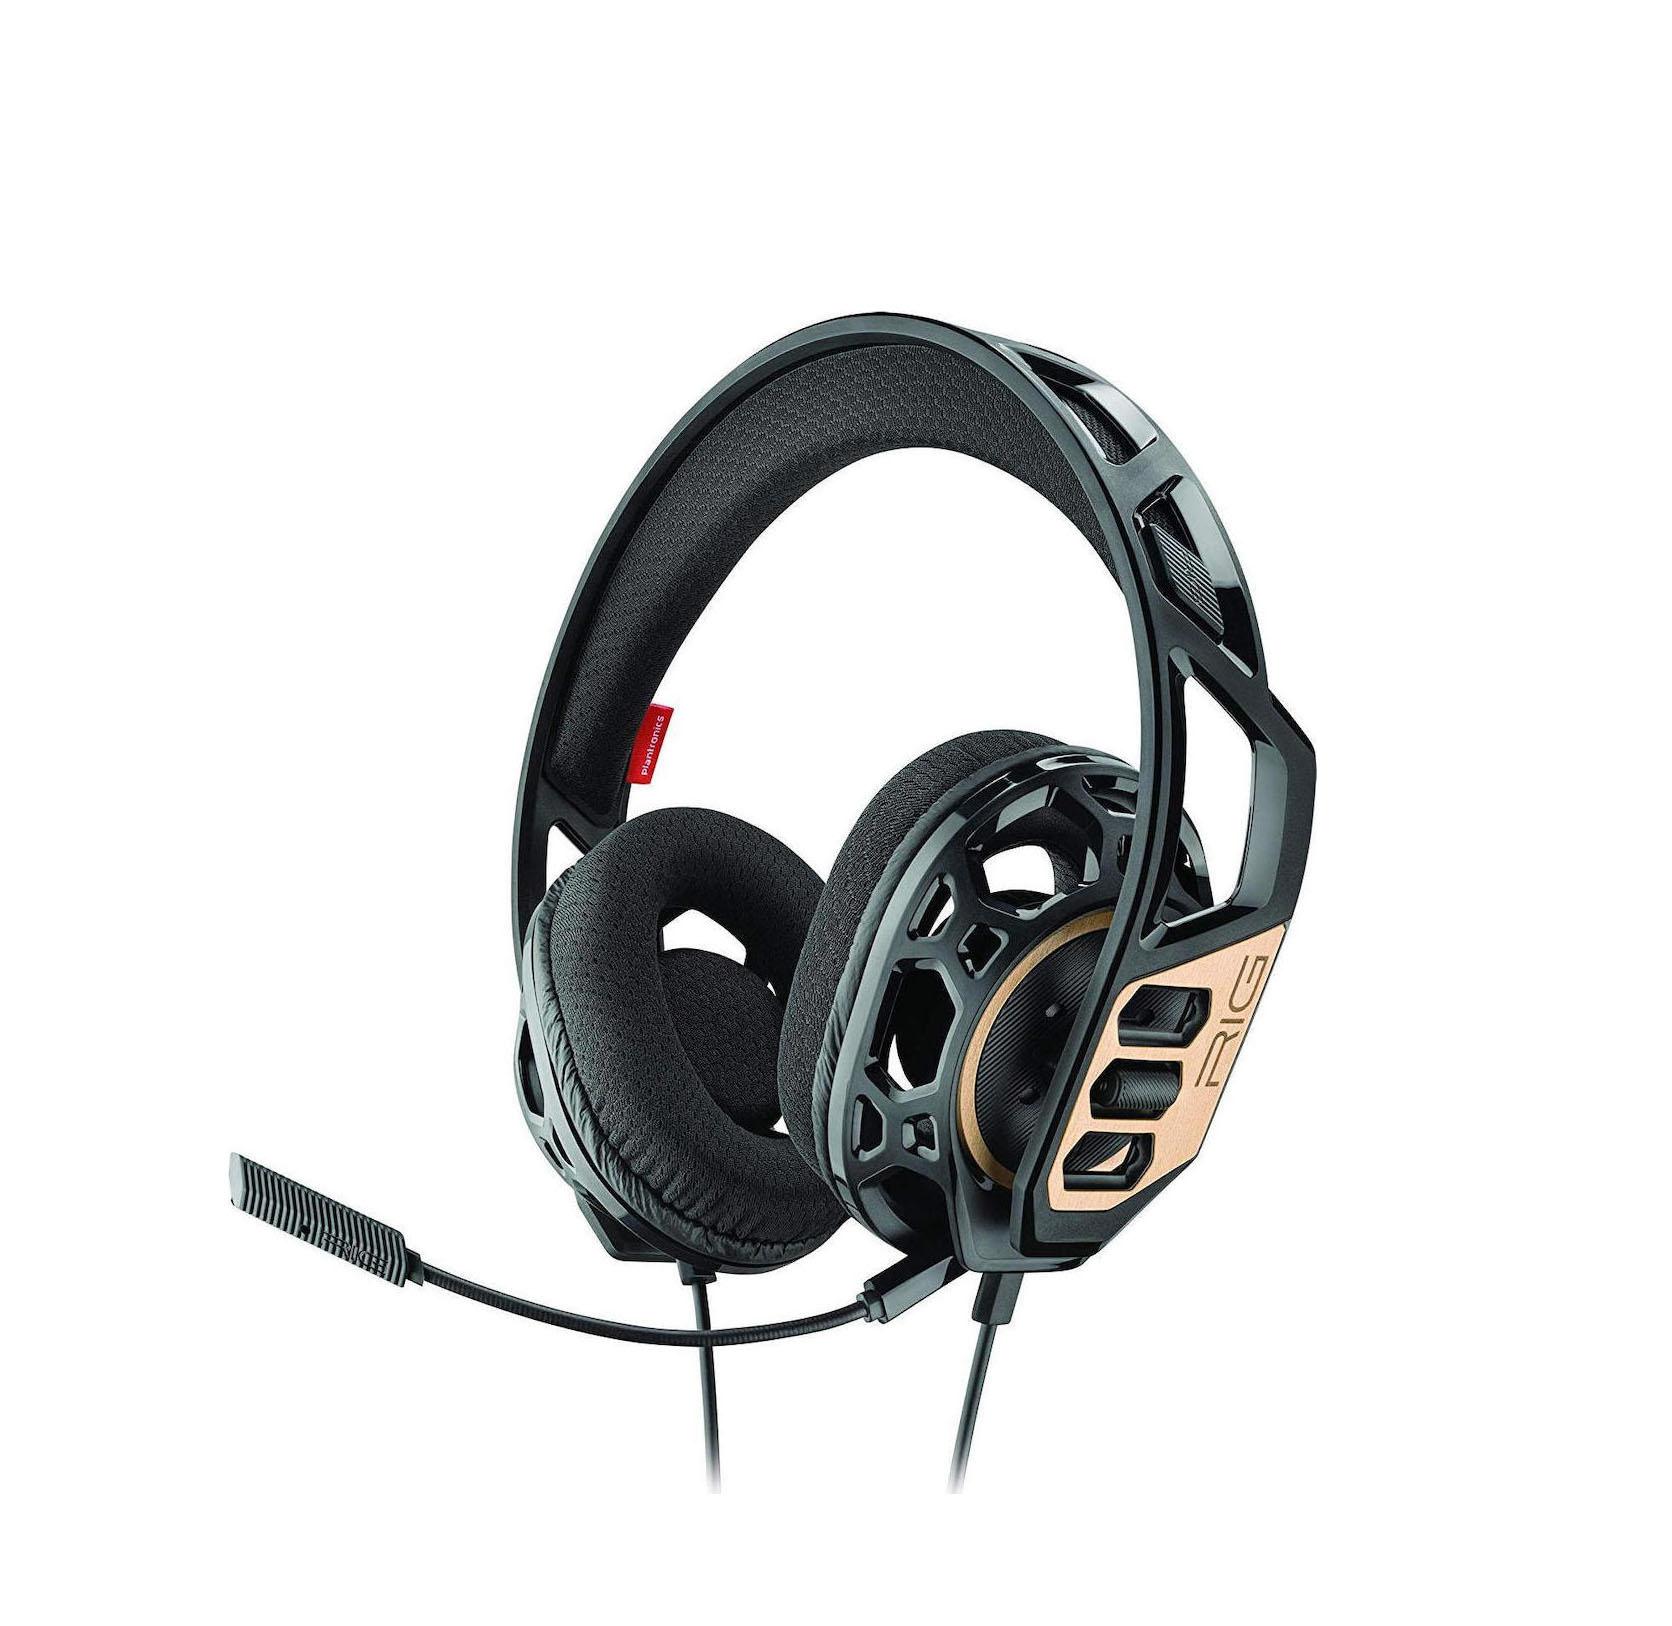 Plantronics RIG 300 Gaming Headphone